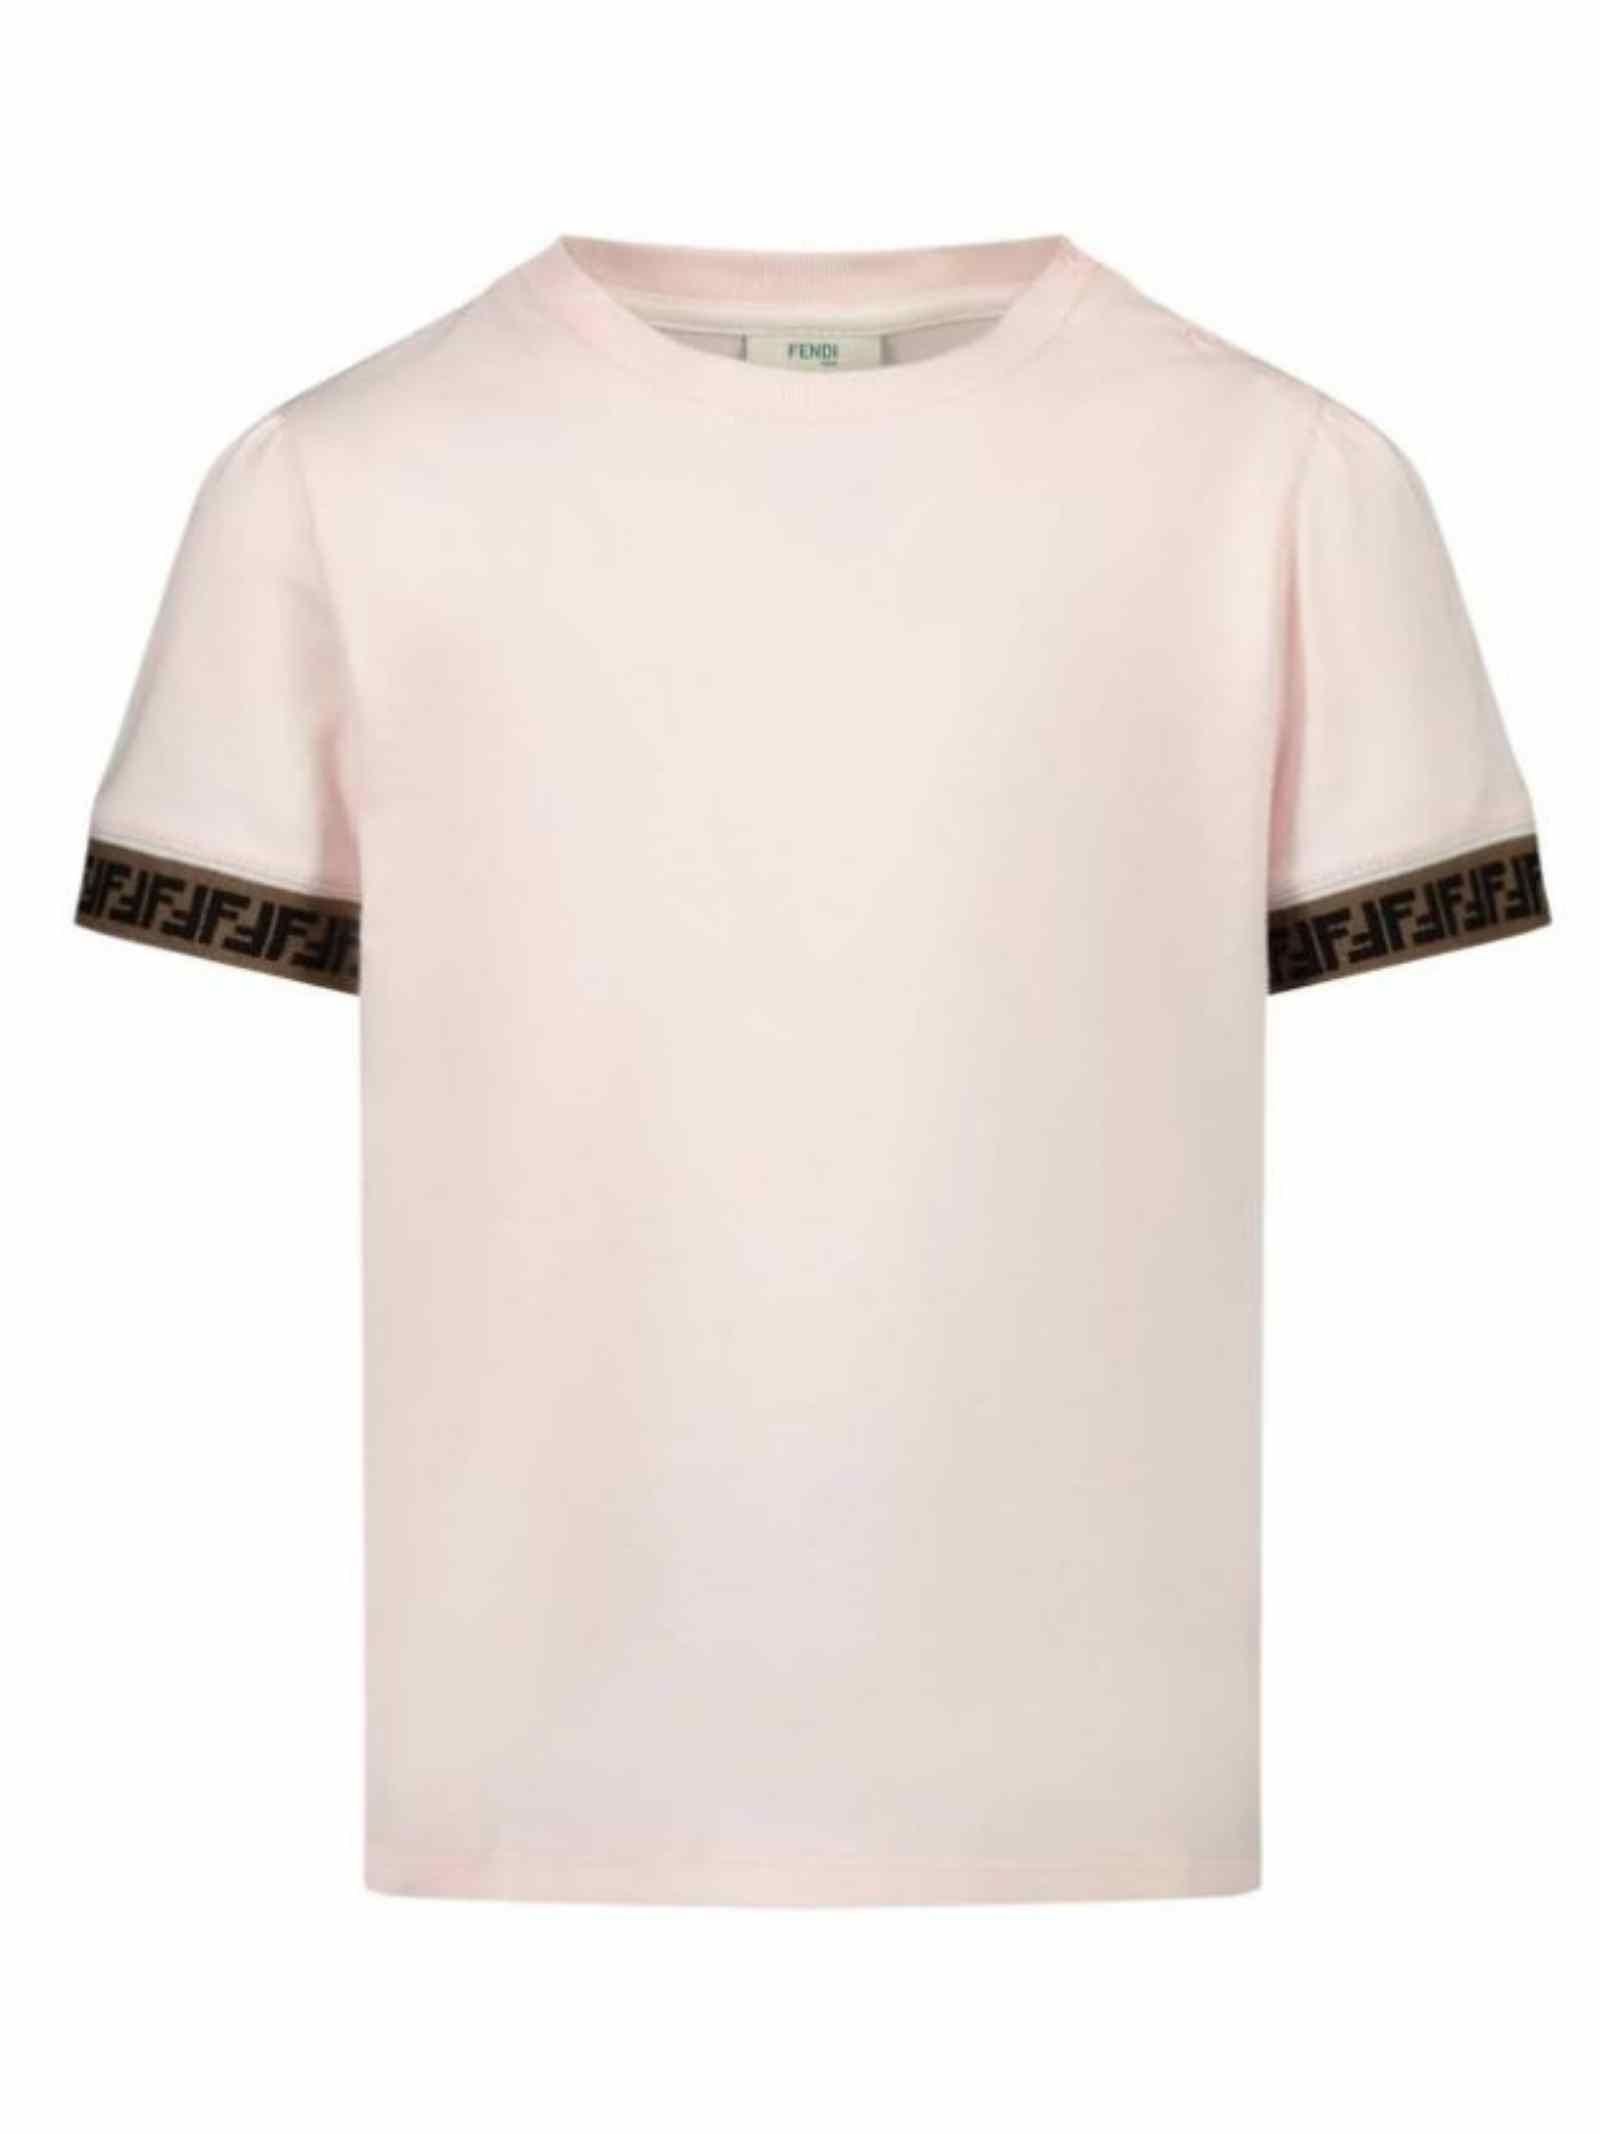 Fendi | T-shirt | BFI117 ST8F0C11